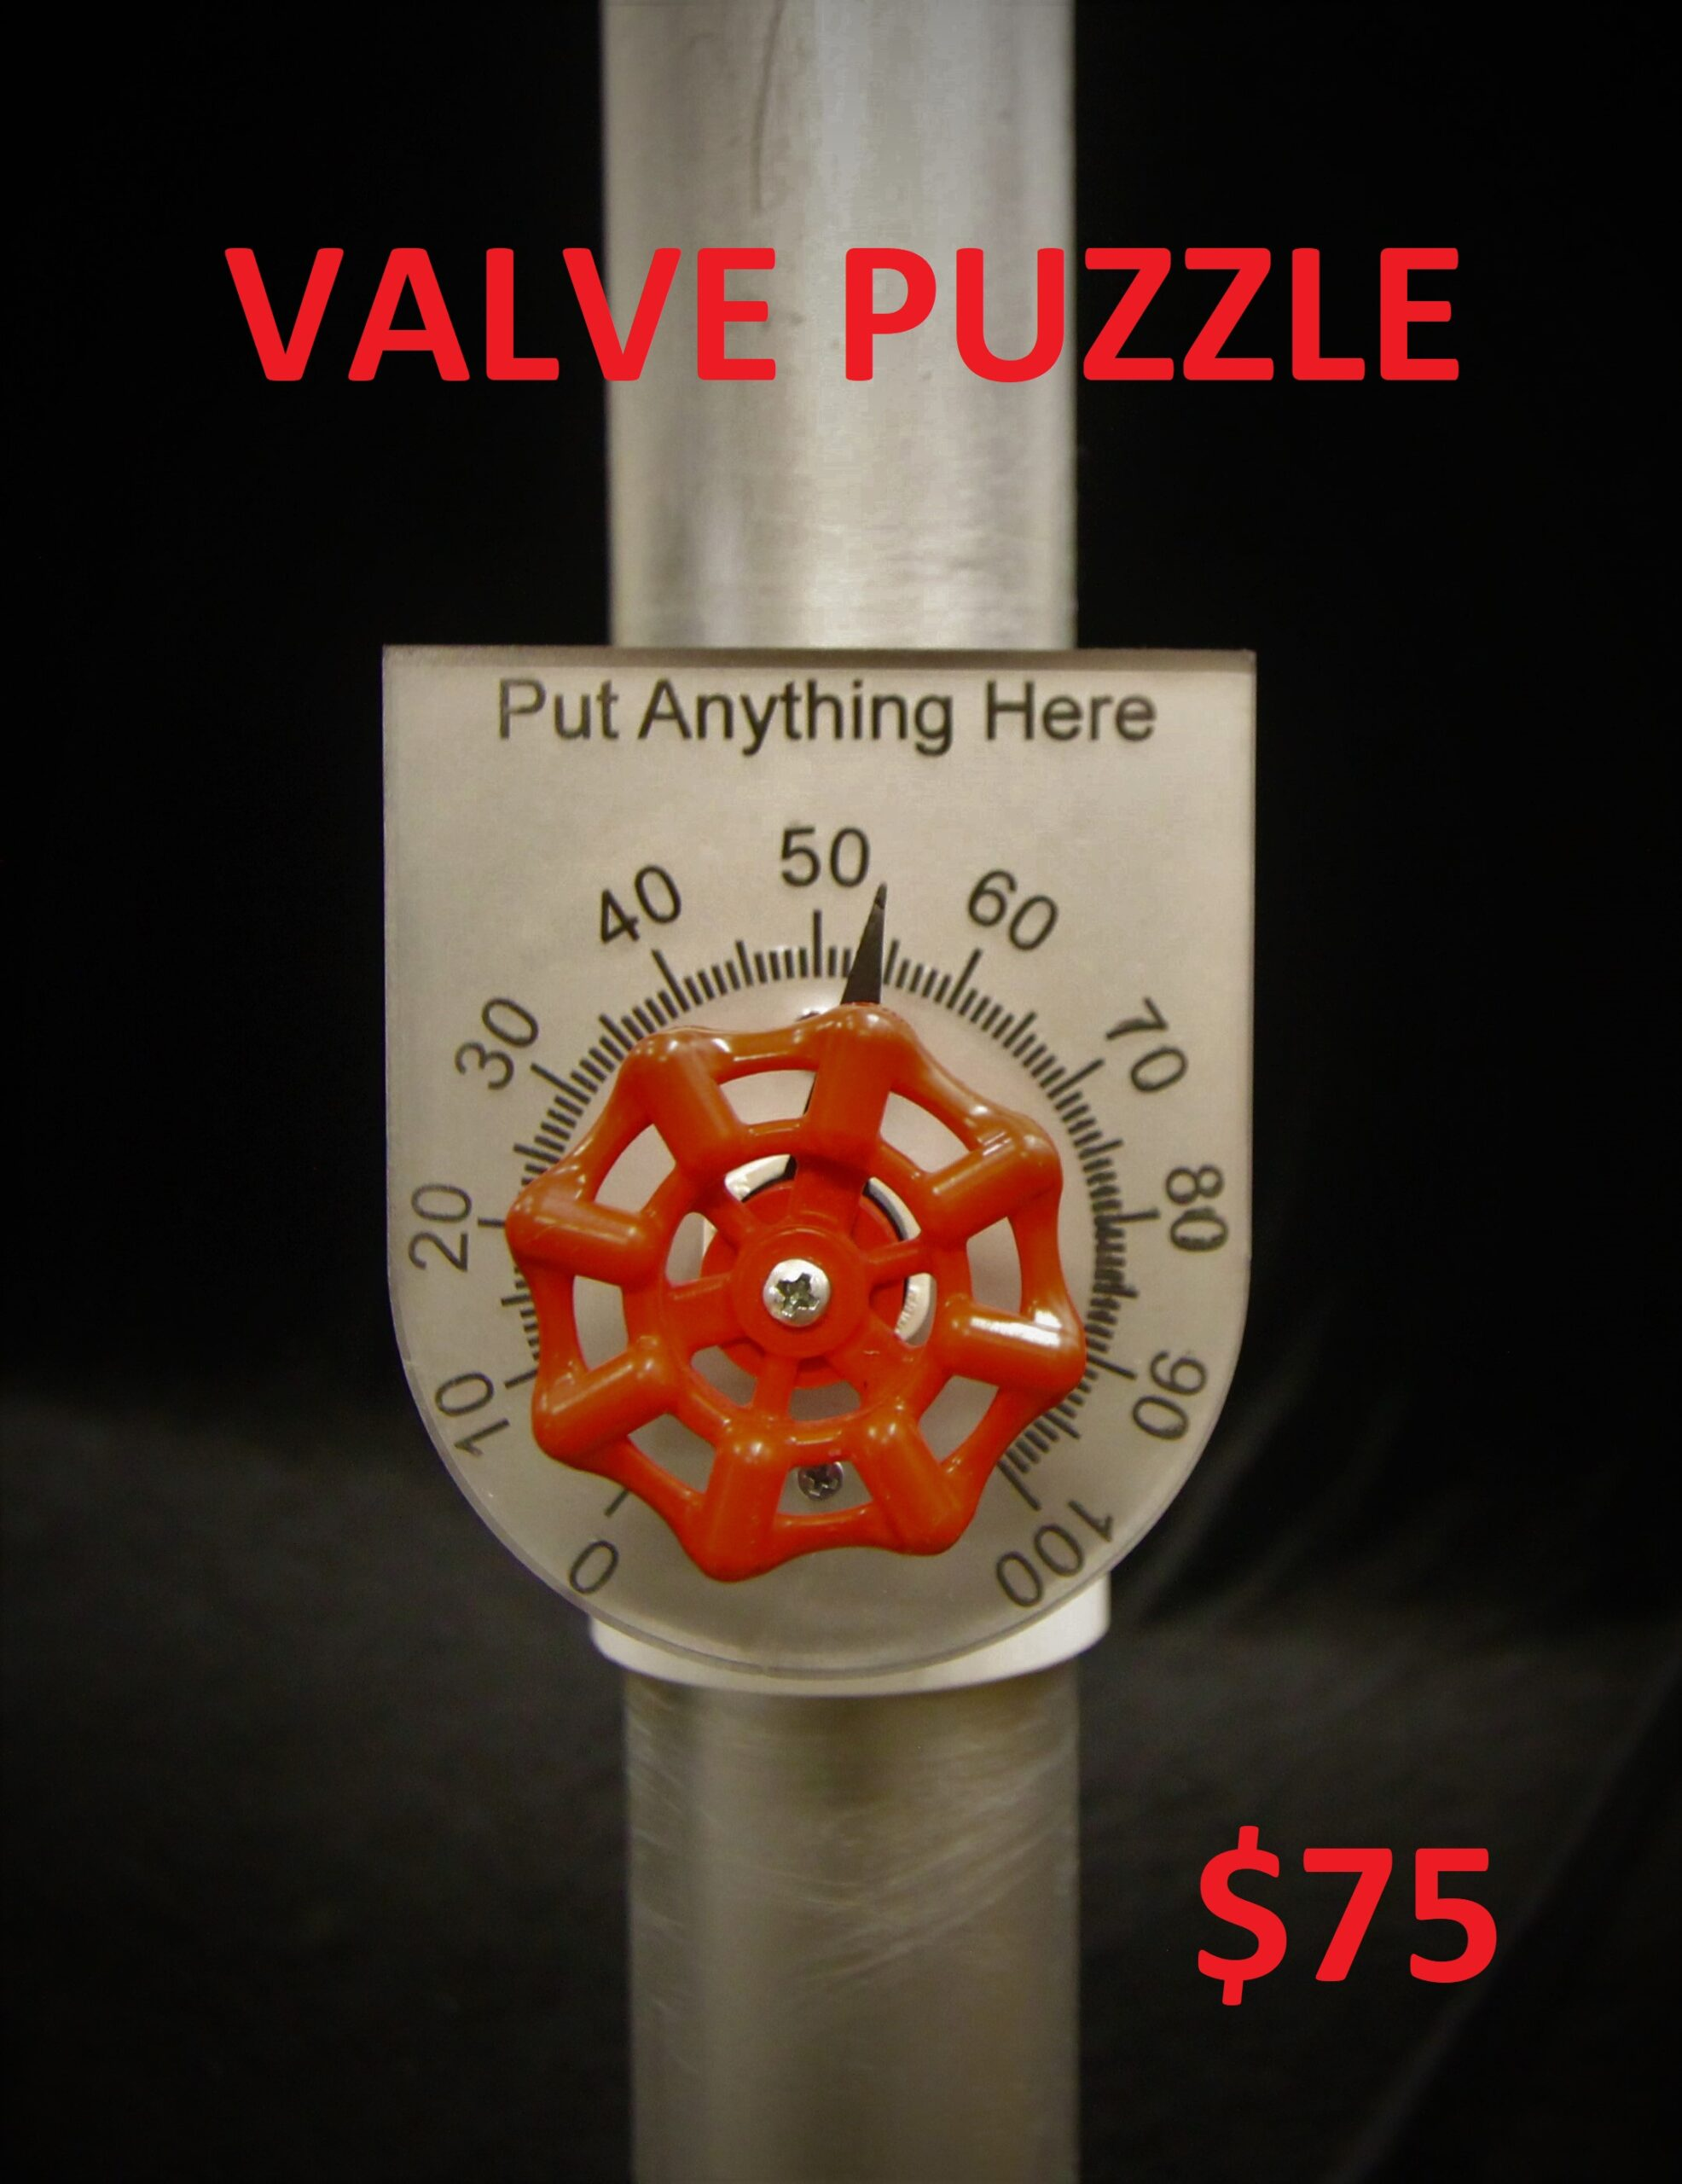 Valve Puzzle Image